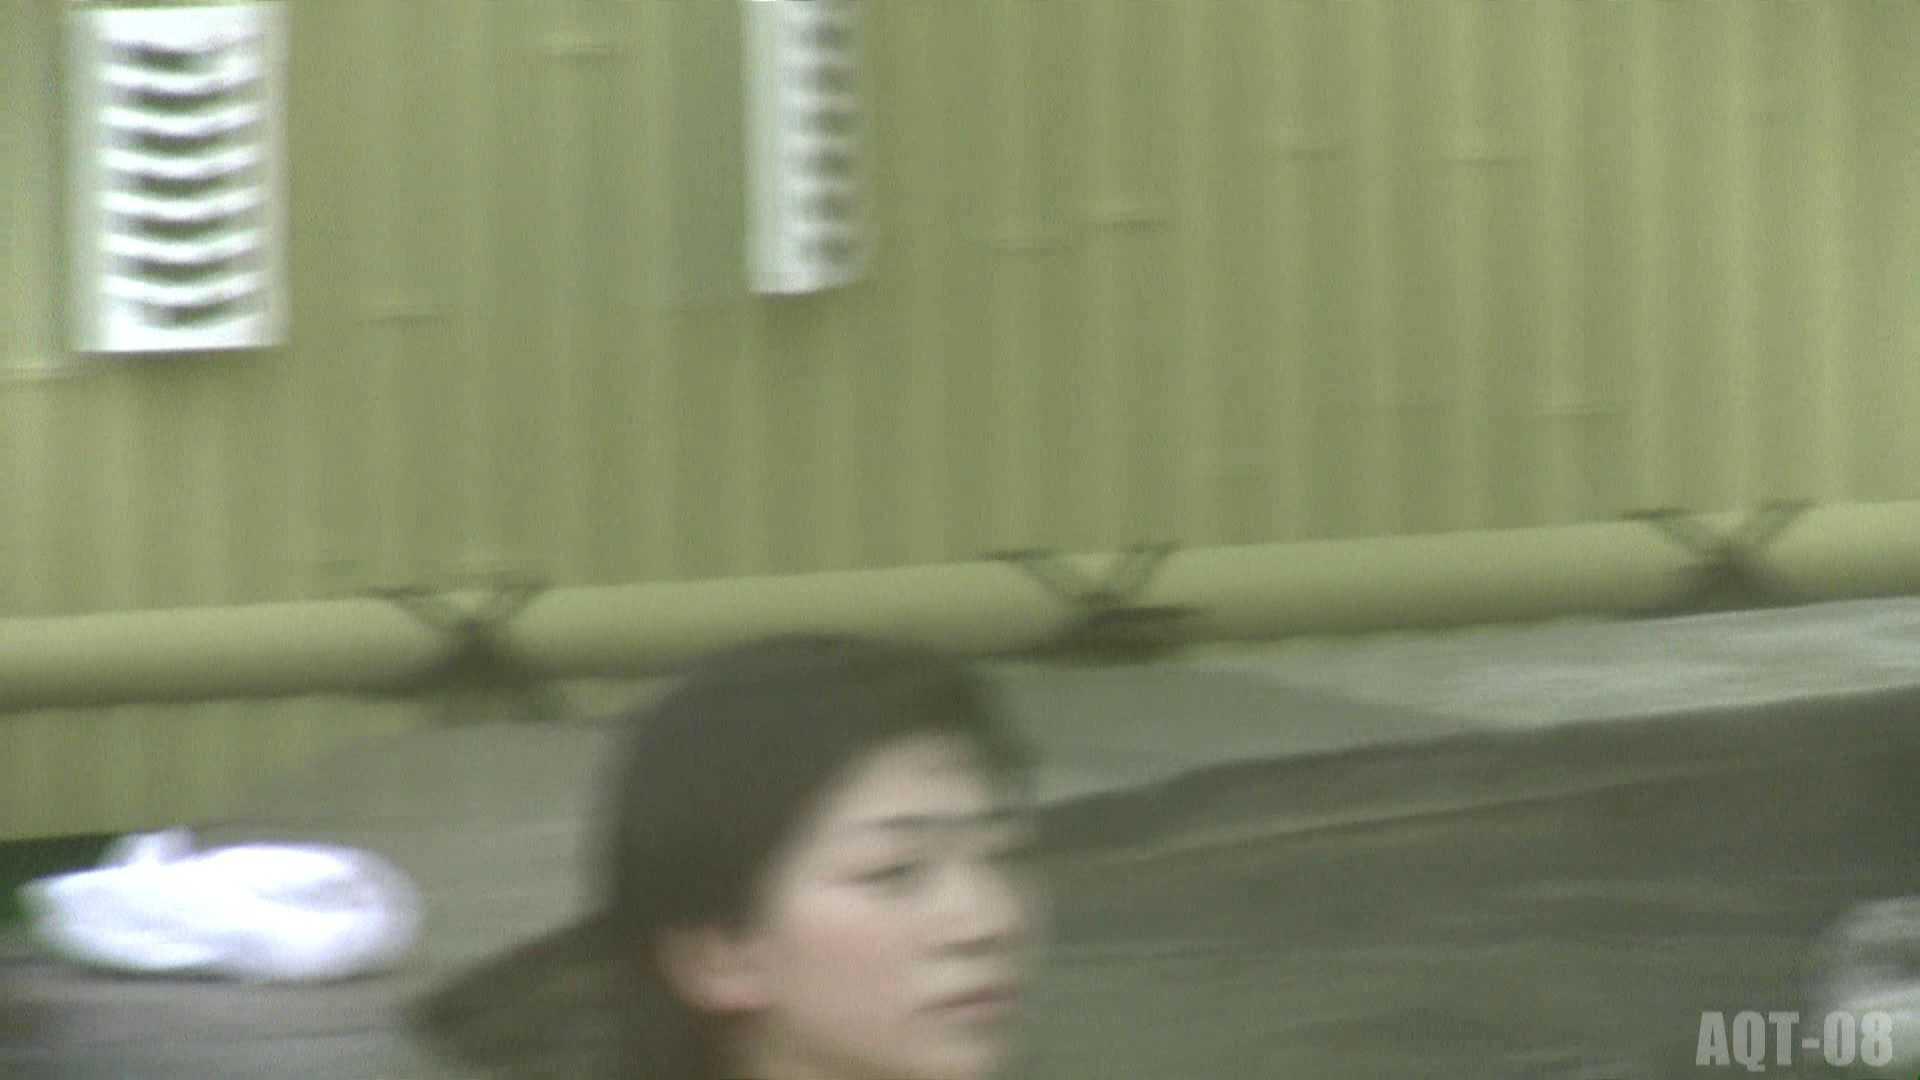 Aquaな露天風呂Vol.776 盗撮 エロ無料画像 108画像 92